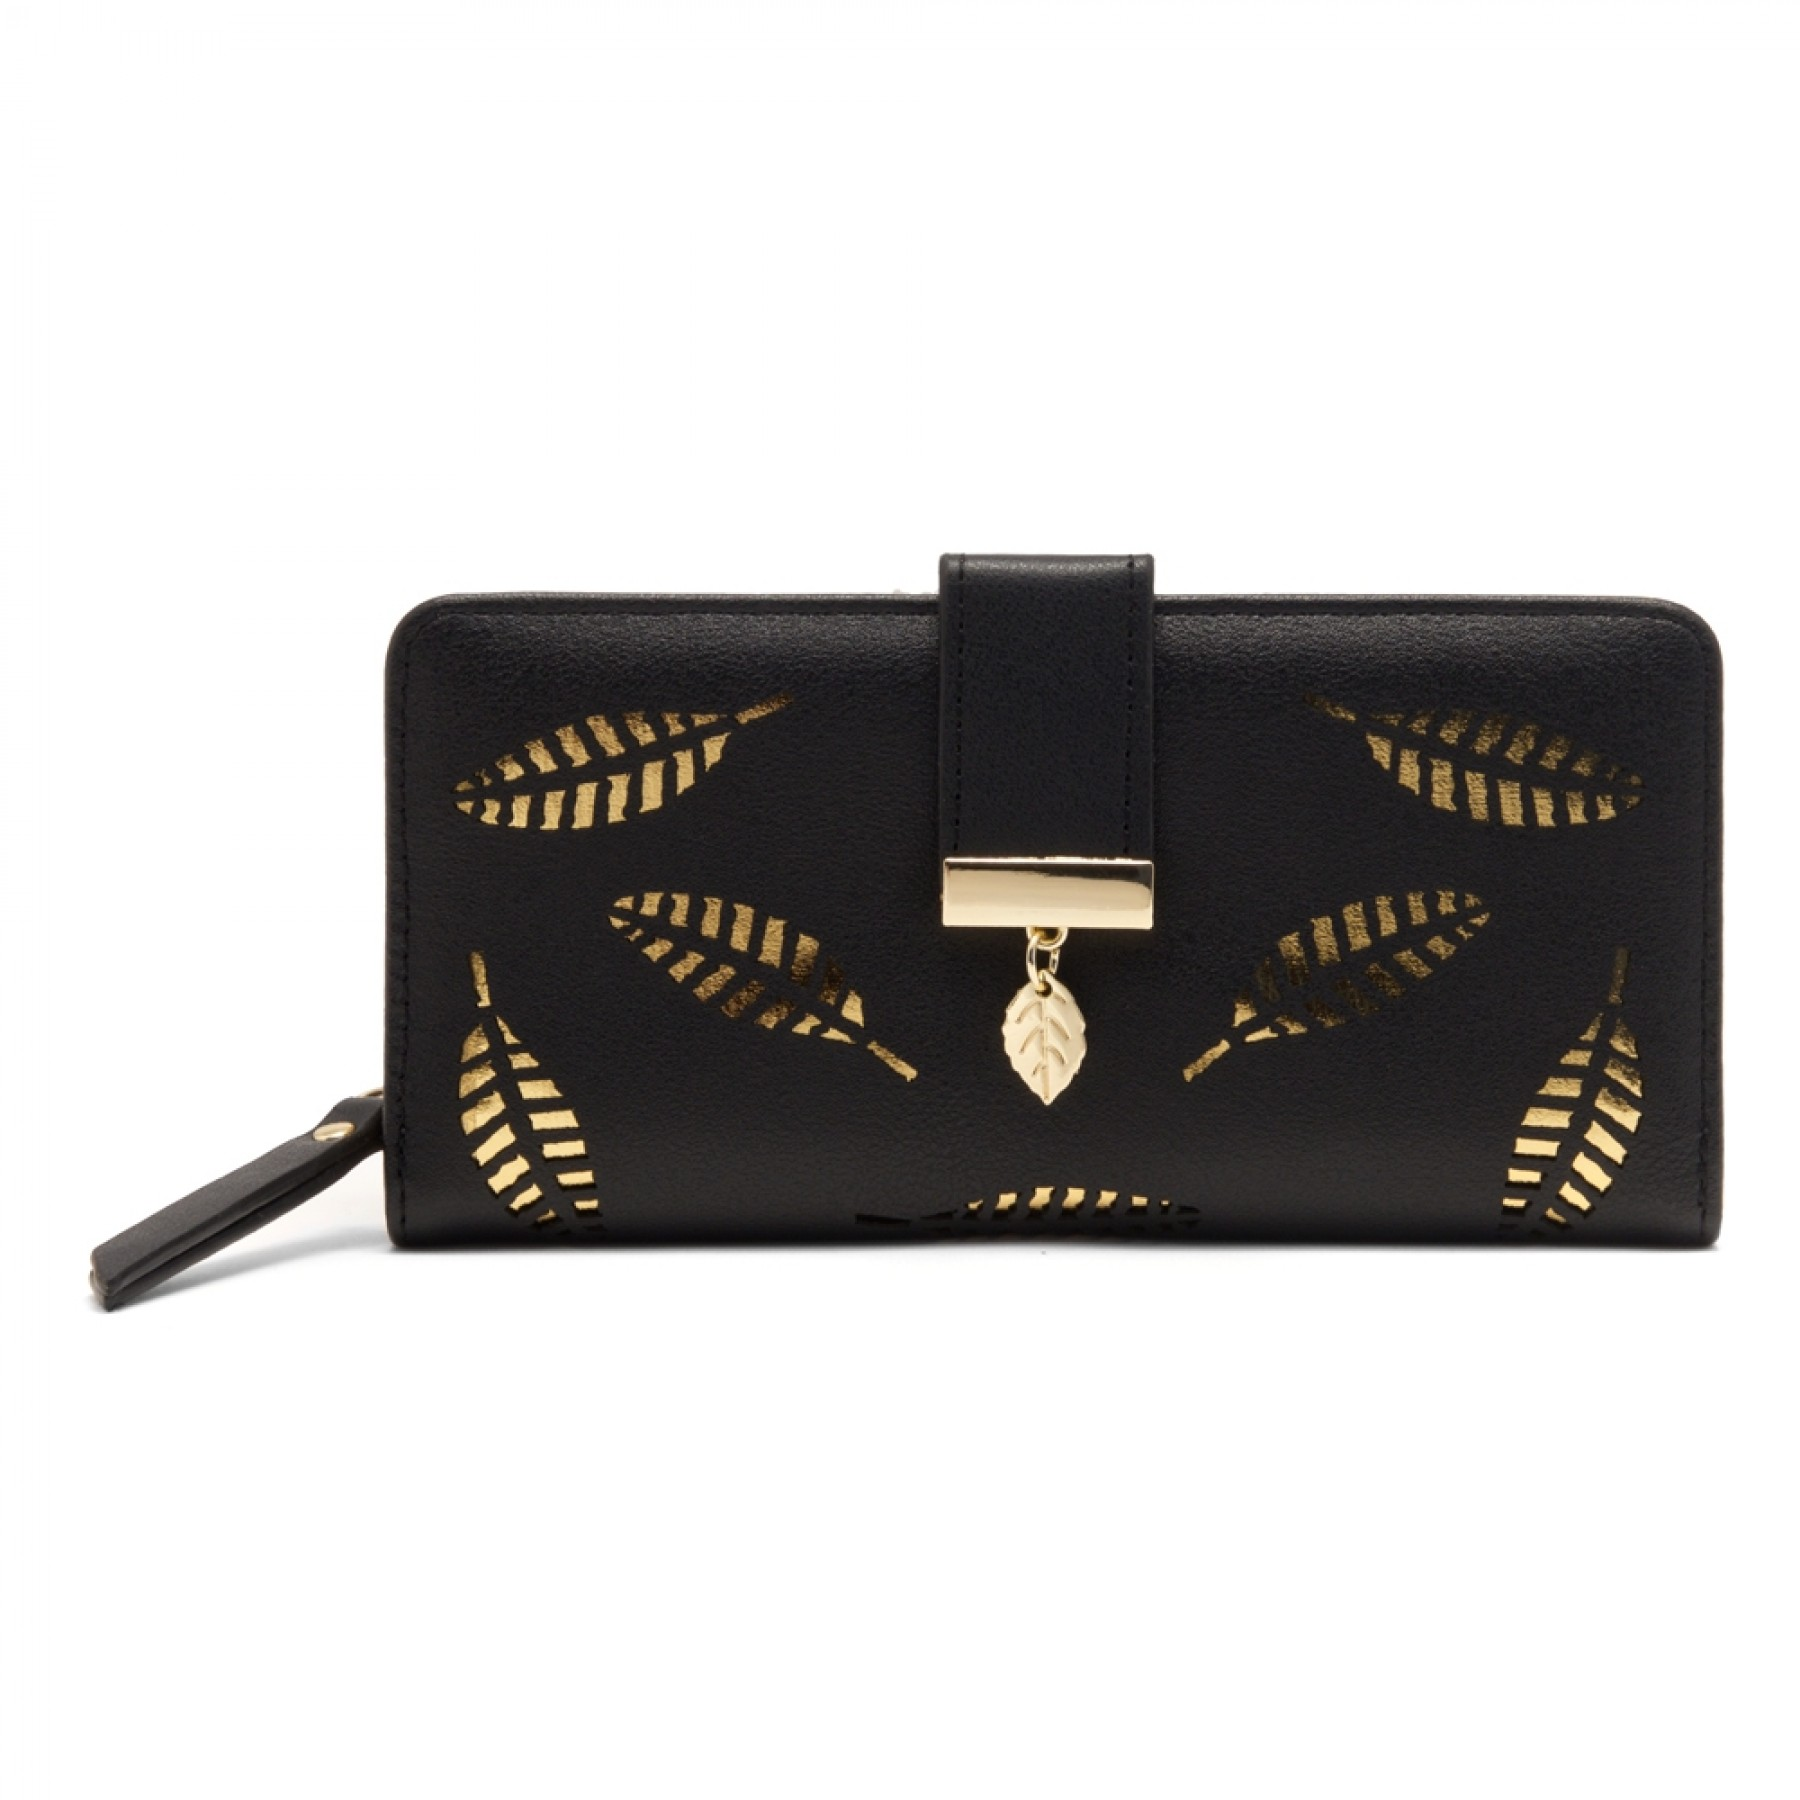 SZ17-LH1-15739 - Women's Wallet with Card slots and ID window Zipper Purse  (Black)